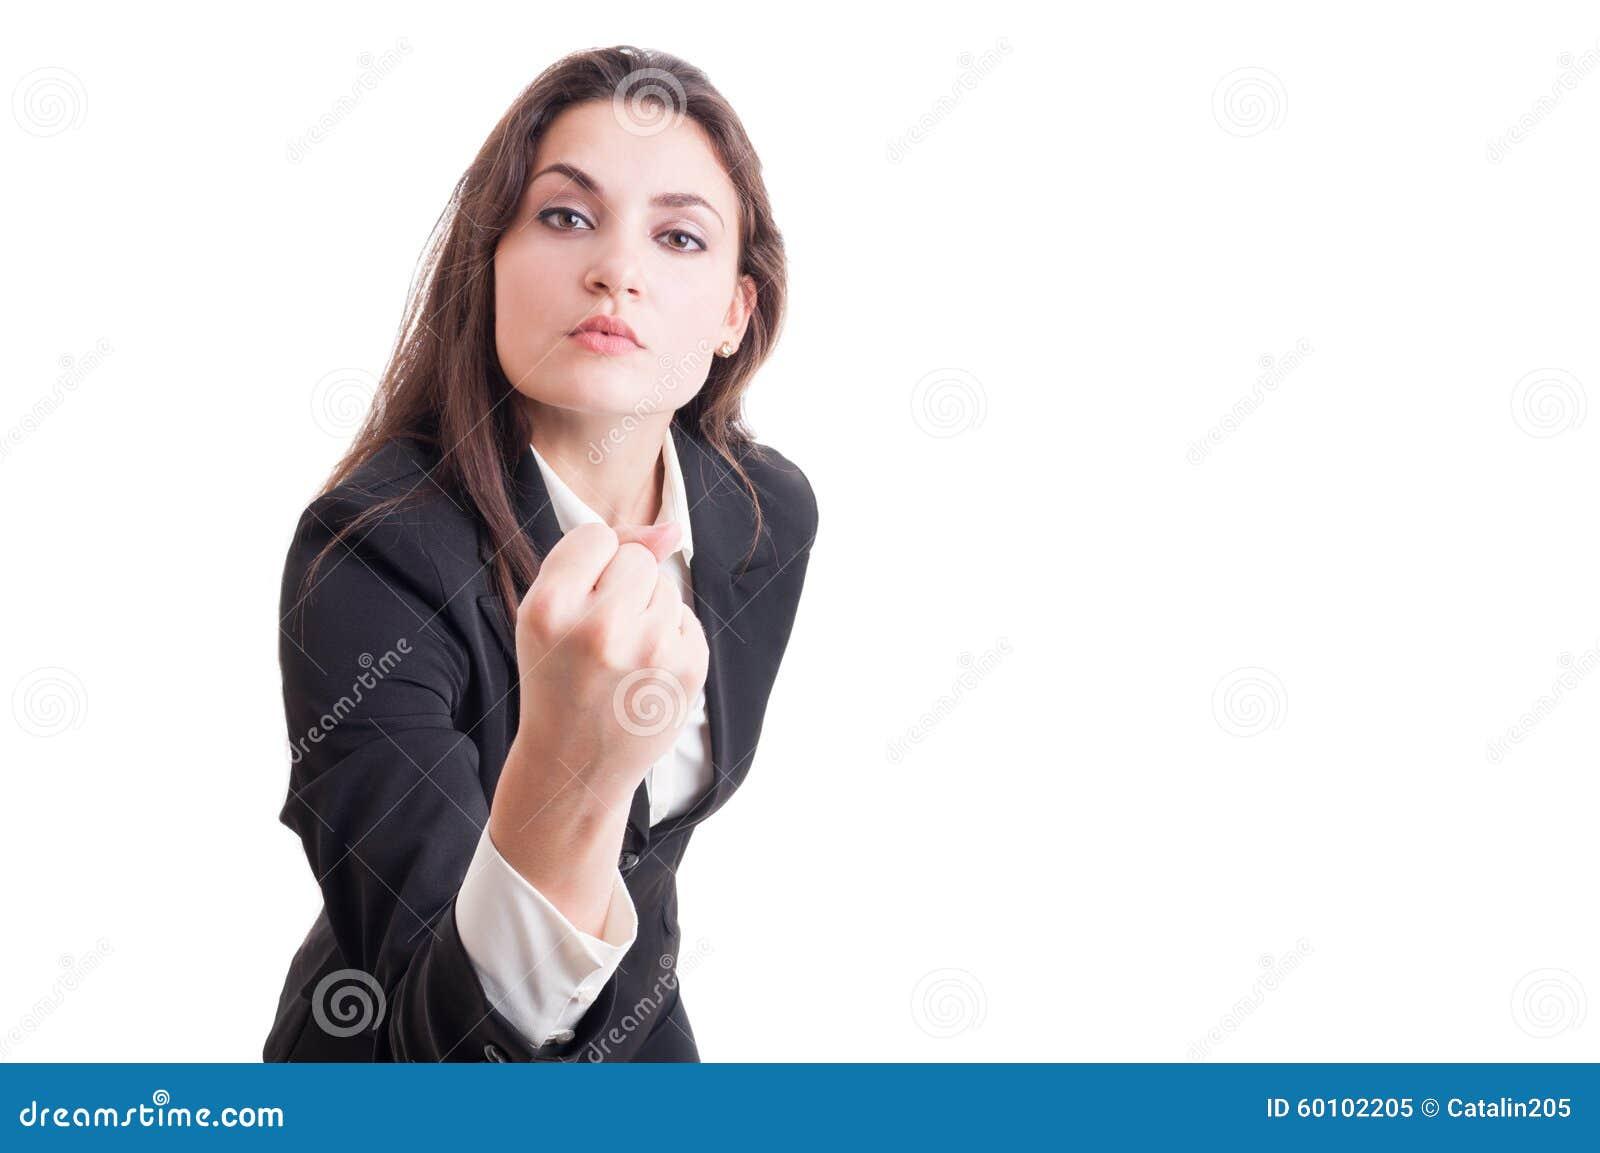 Agressieve bedrijfsvrouw, leider of bazige manager die vuist tonen